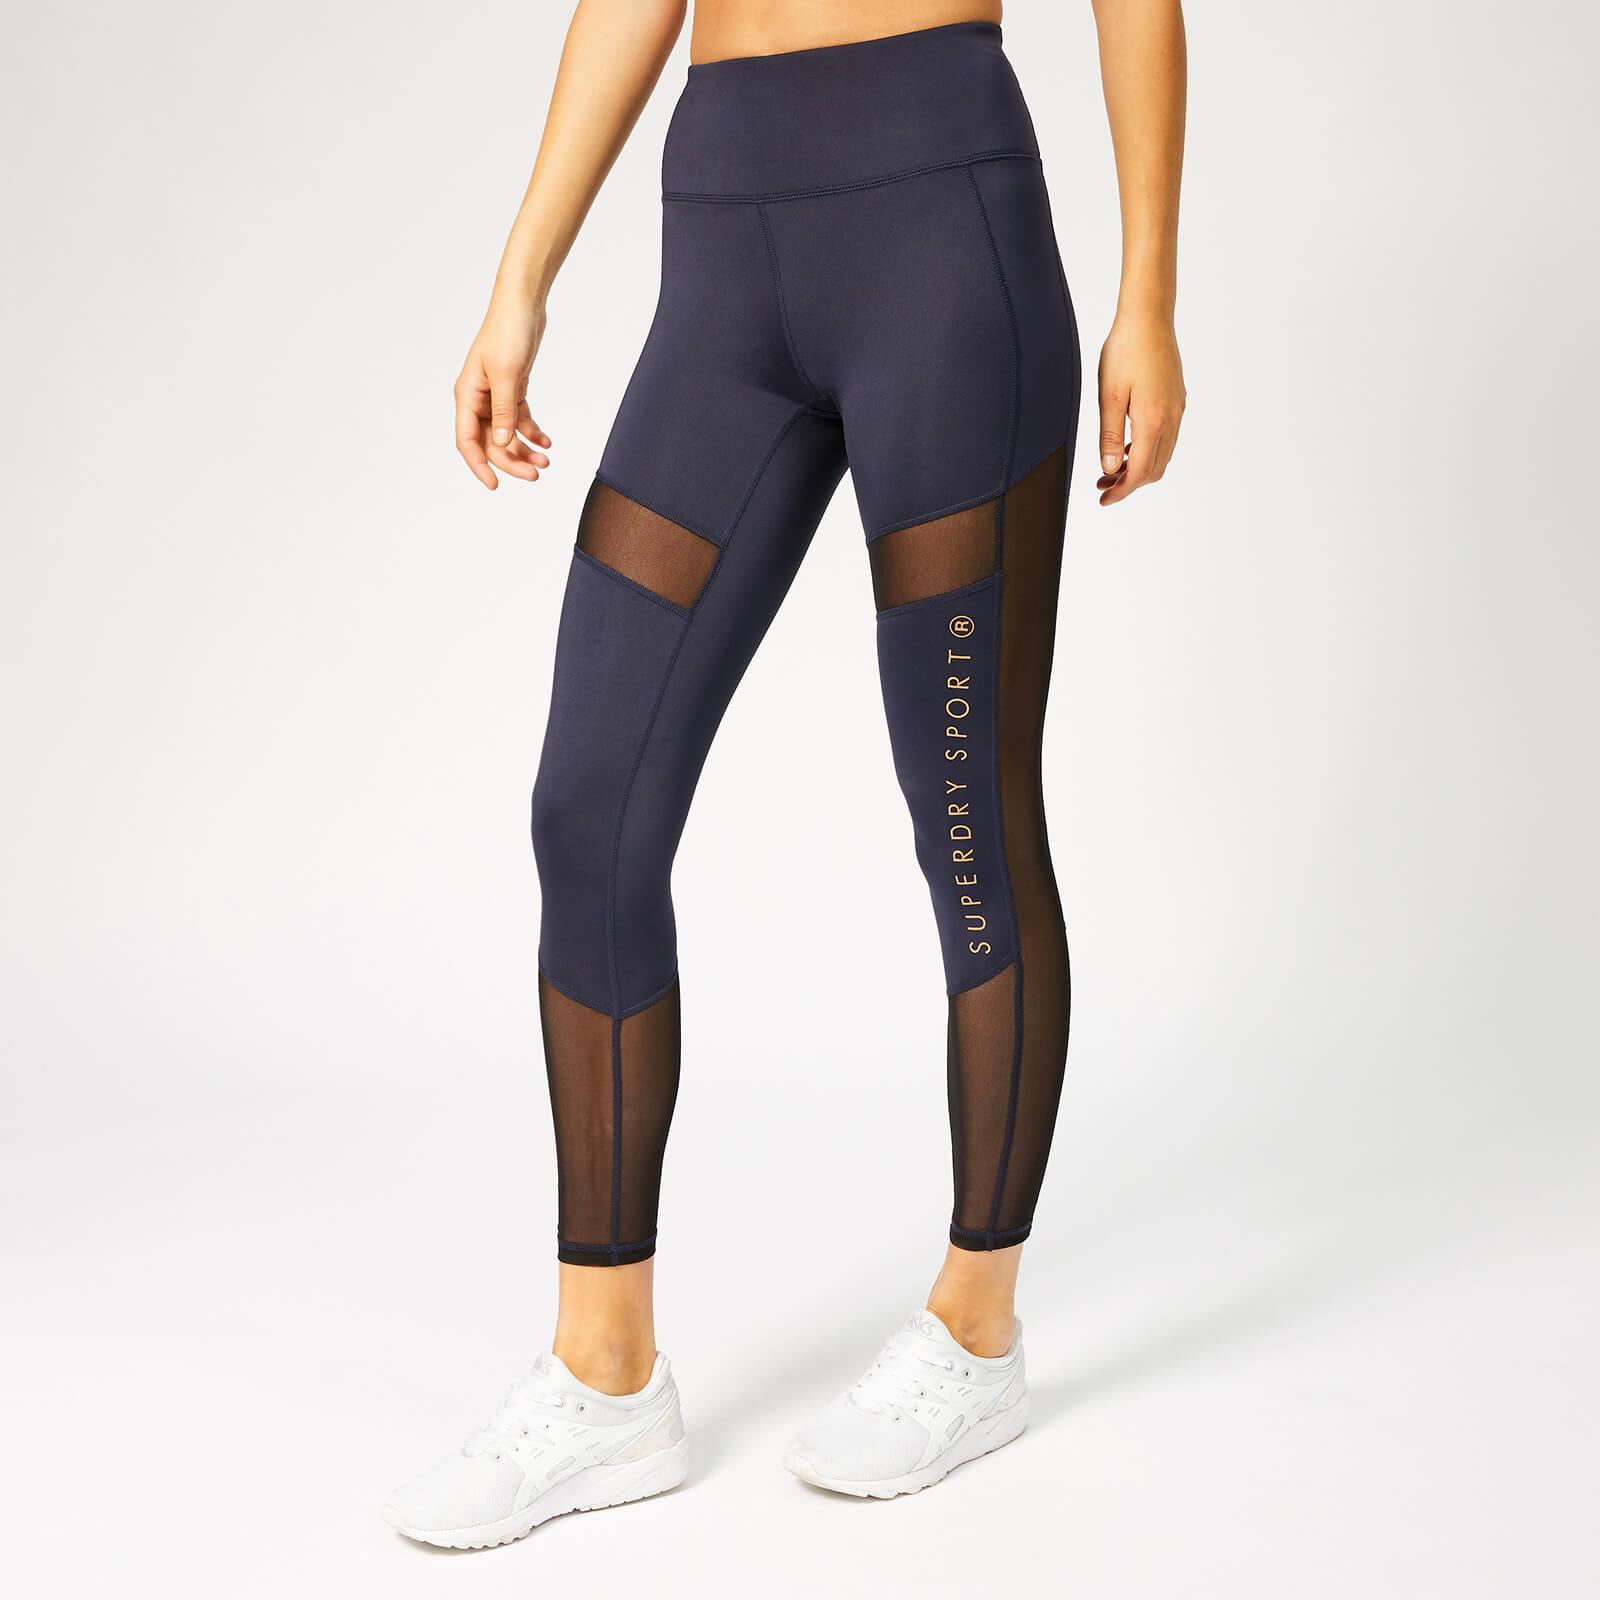 Superdry Sport Women's Active Studio Mesh Leggings - Eclispe Navy Marl - M - Blue